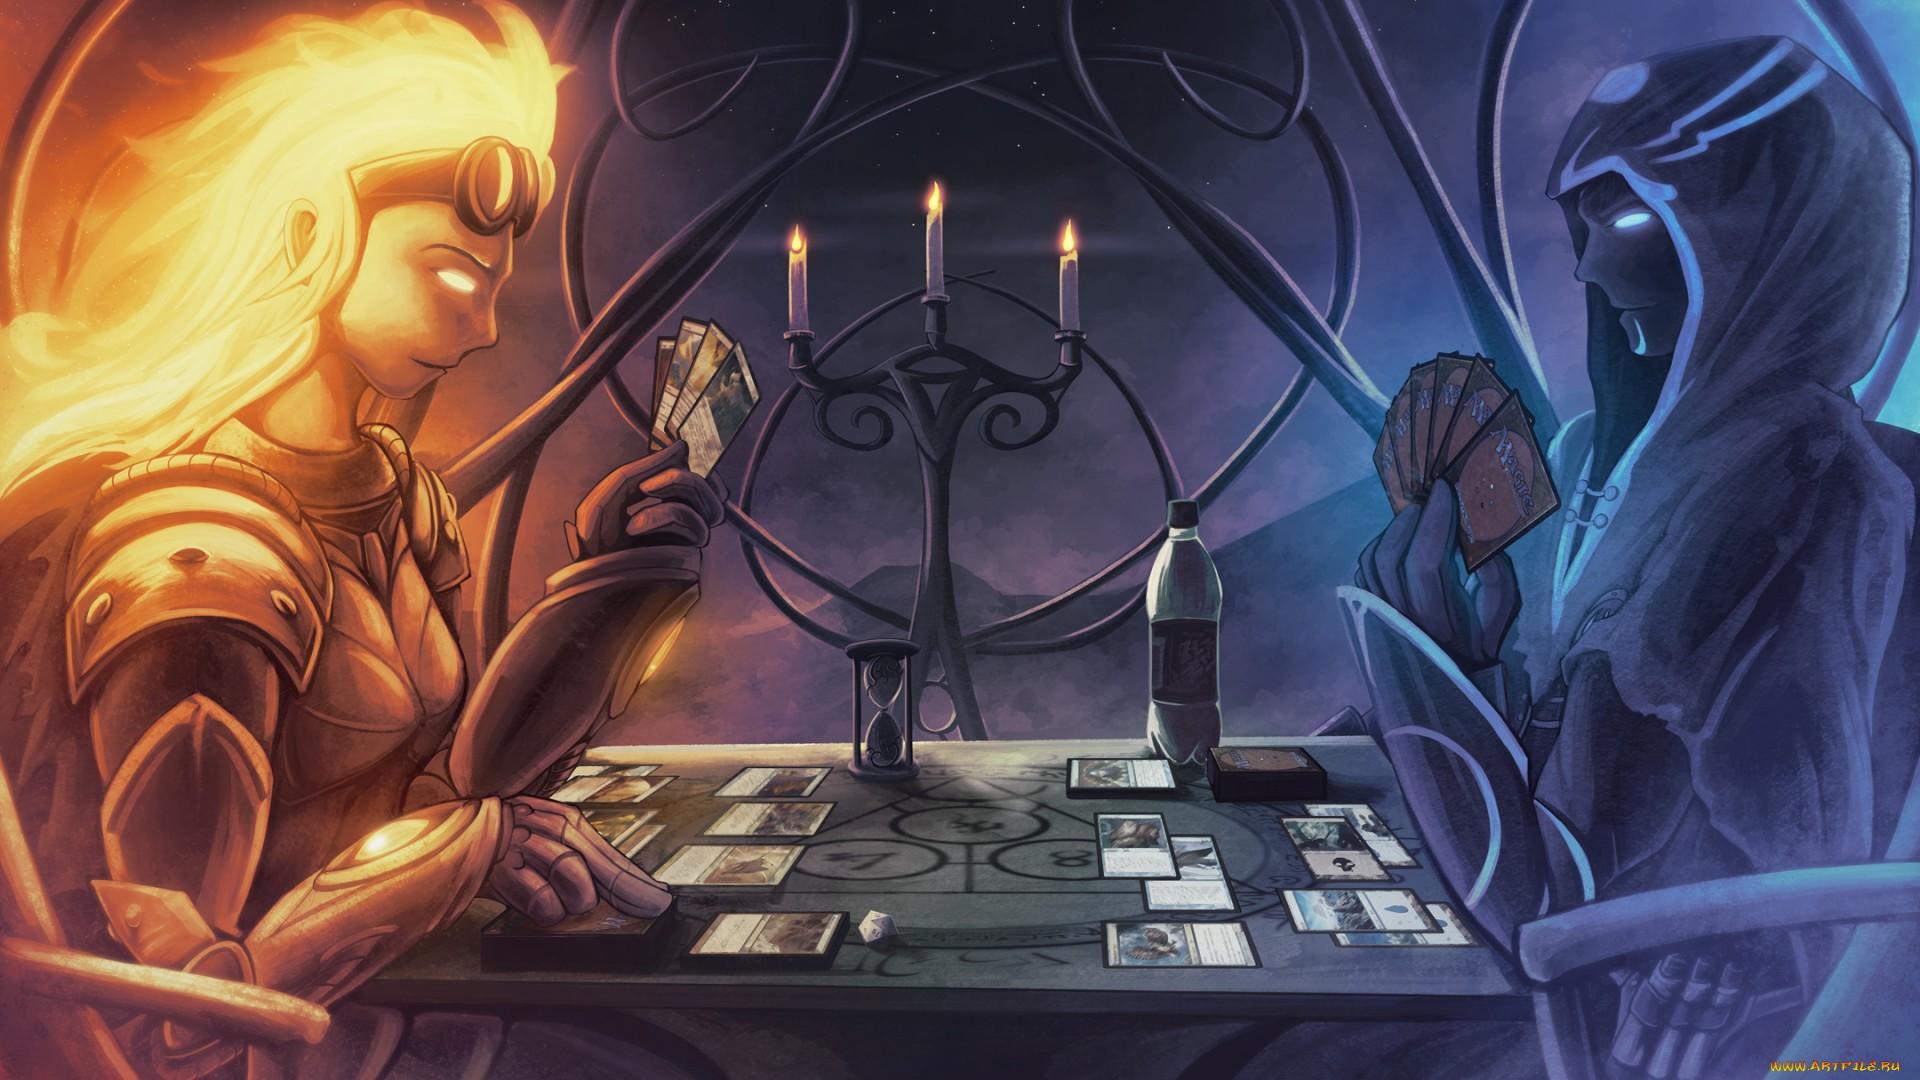 Magic: The Gathering Full HD Fond d'écran and Arrière-plan ... Planeswalker Points